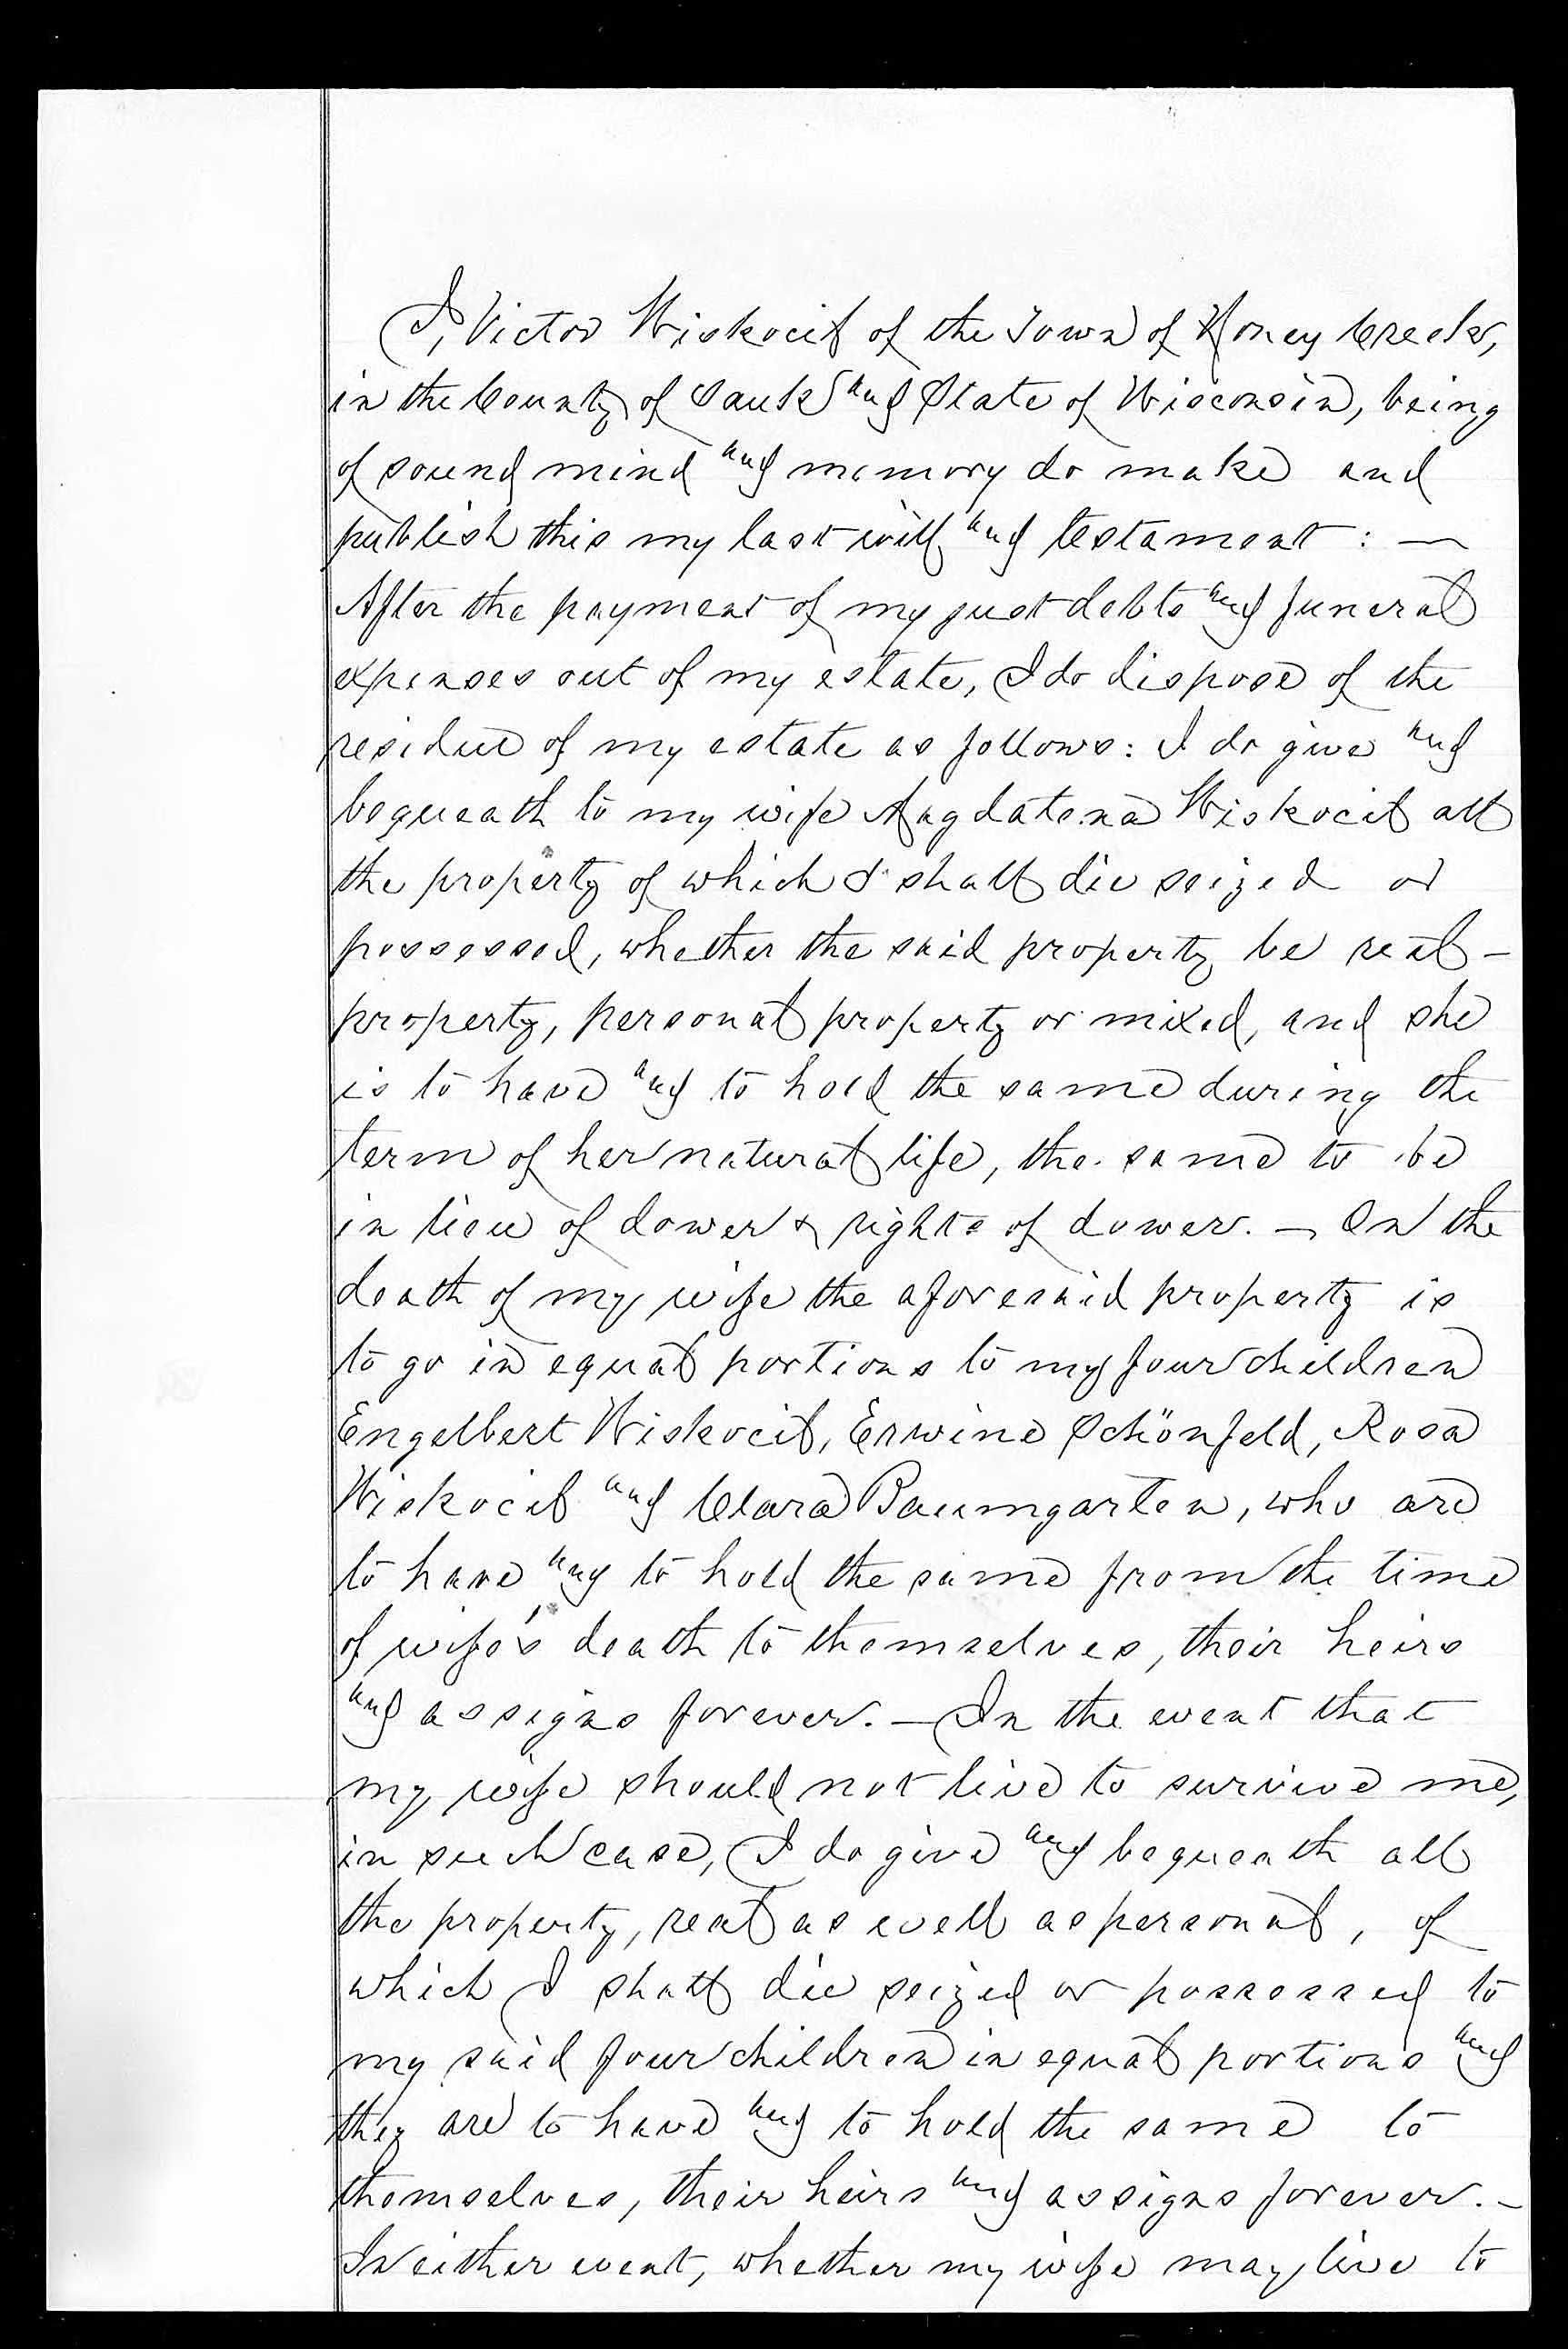 Friede-Abrahamson Genealogy Site - Will of Victor Wiskocil ...